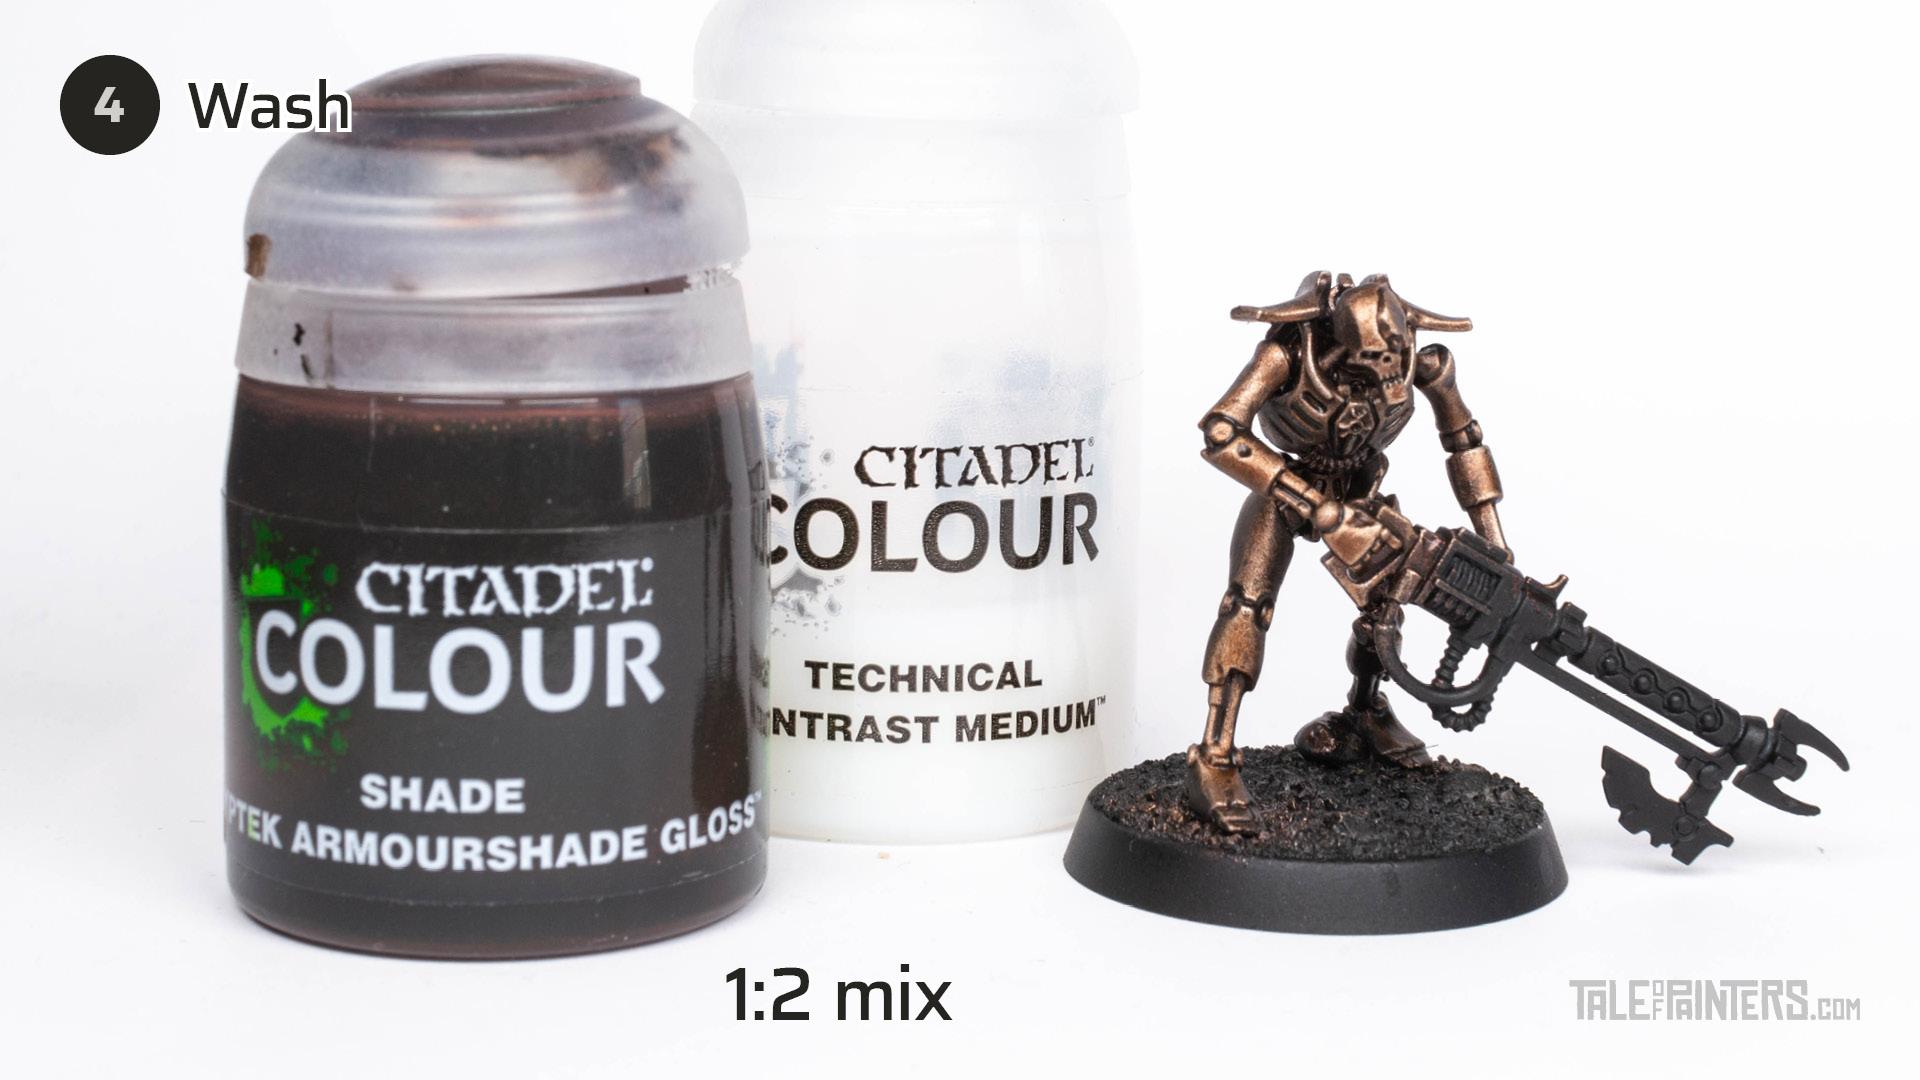 Tutorial: How to paint Necrons Szarekhan armour - step 4